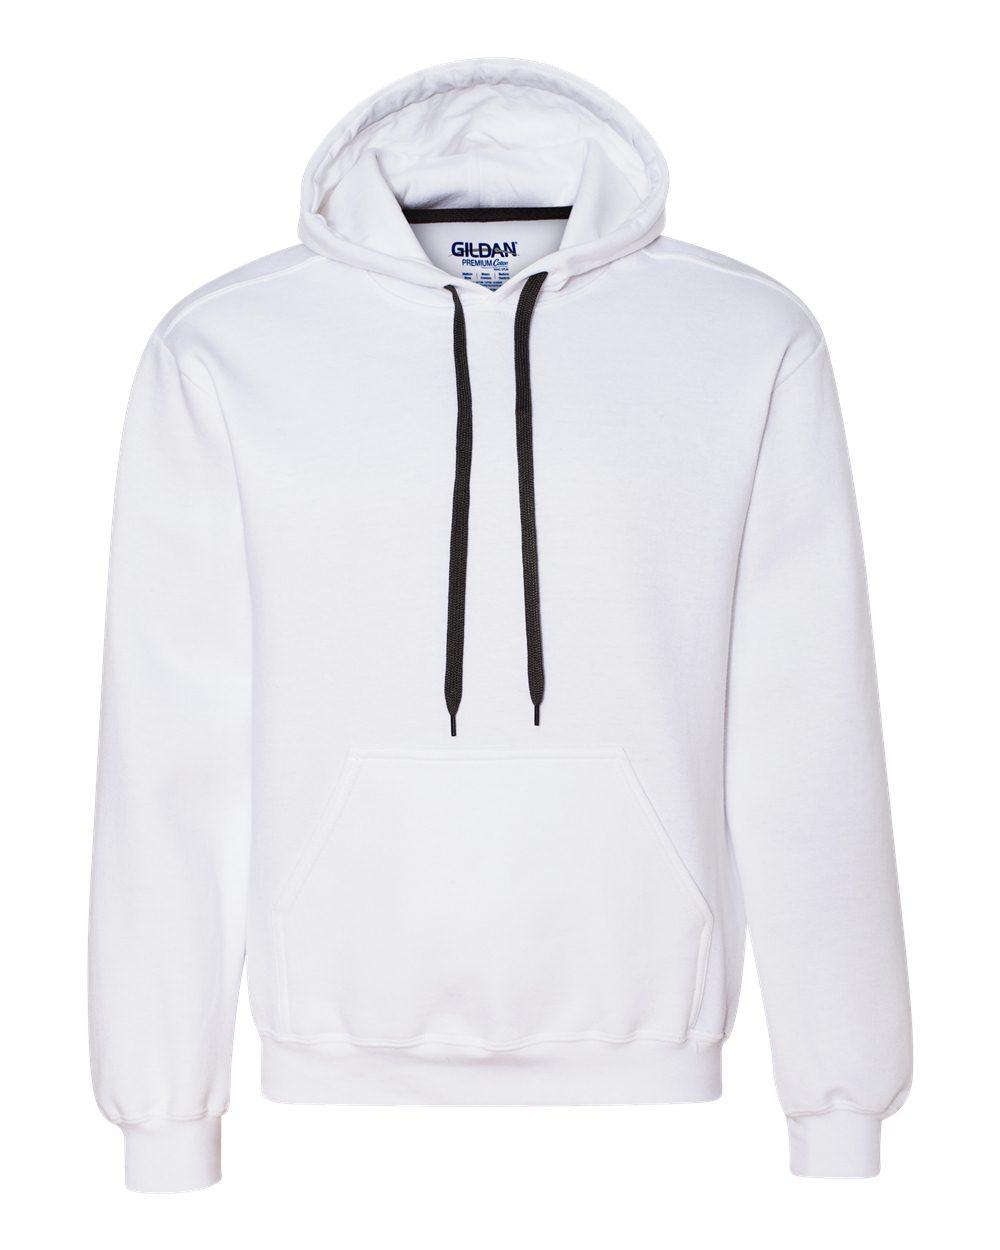 b7cb5dfc GILDAN Custom Hooded Sweatshirt | Premium Fleece Everyday Wear | Entripy